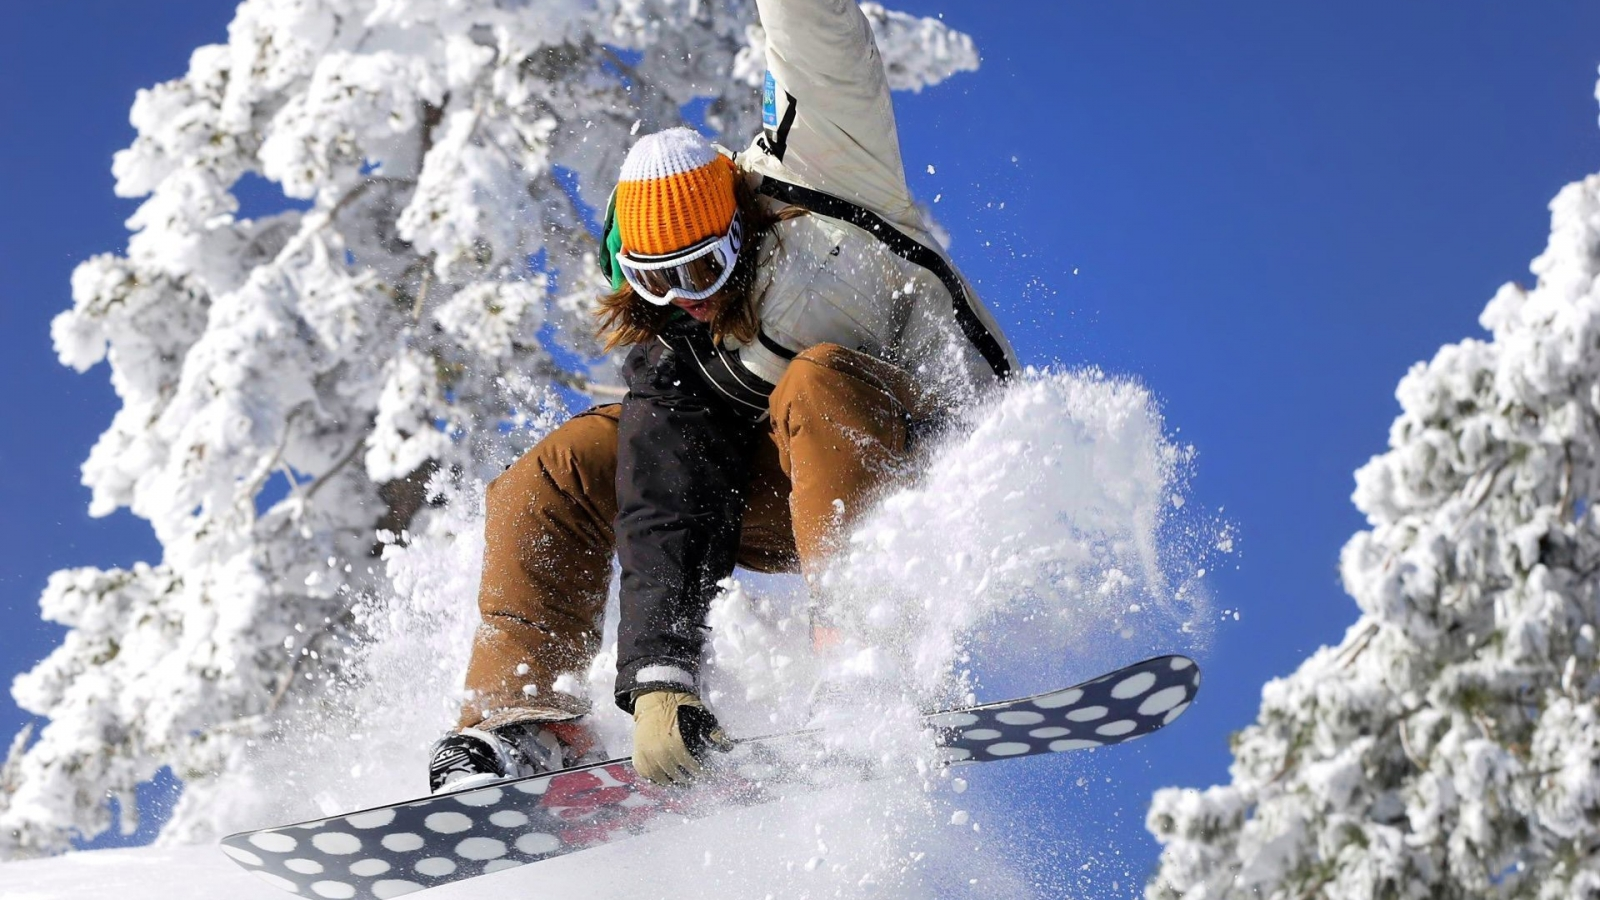 Snowboarding - 1600x900